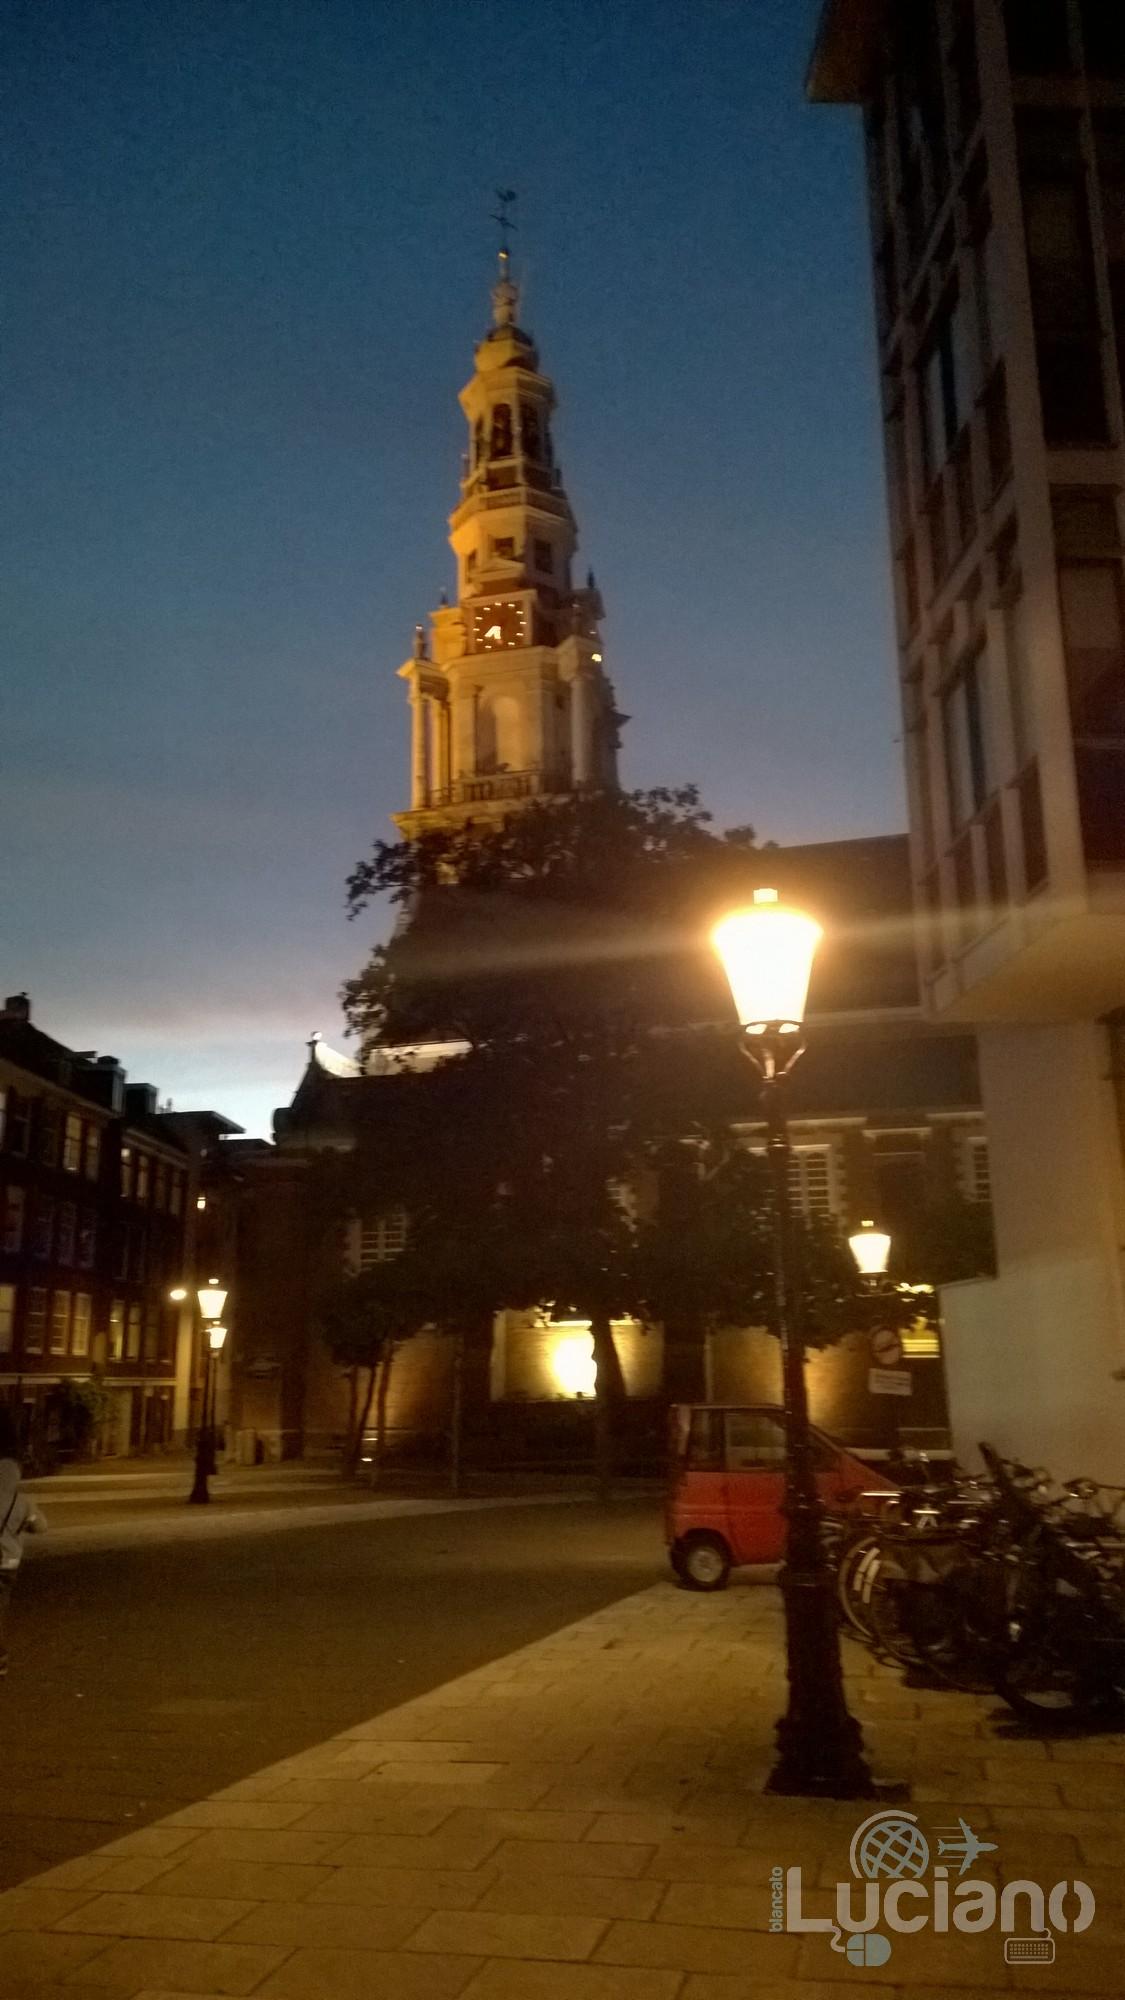 amsterdam-2014-vueling-lucianoblancatoit (53)